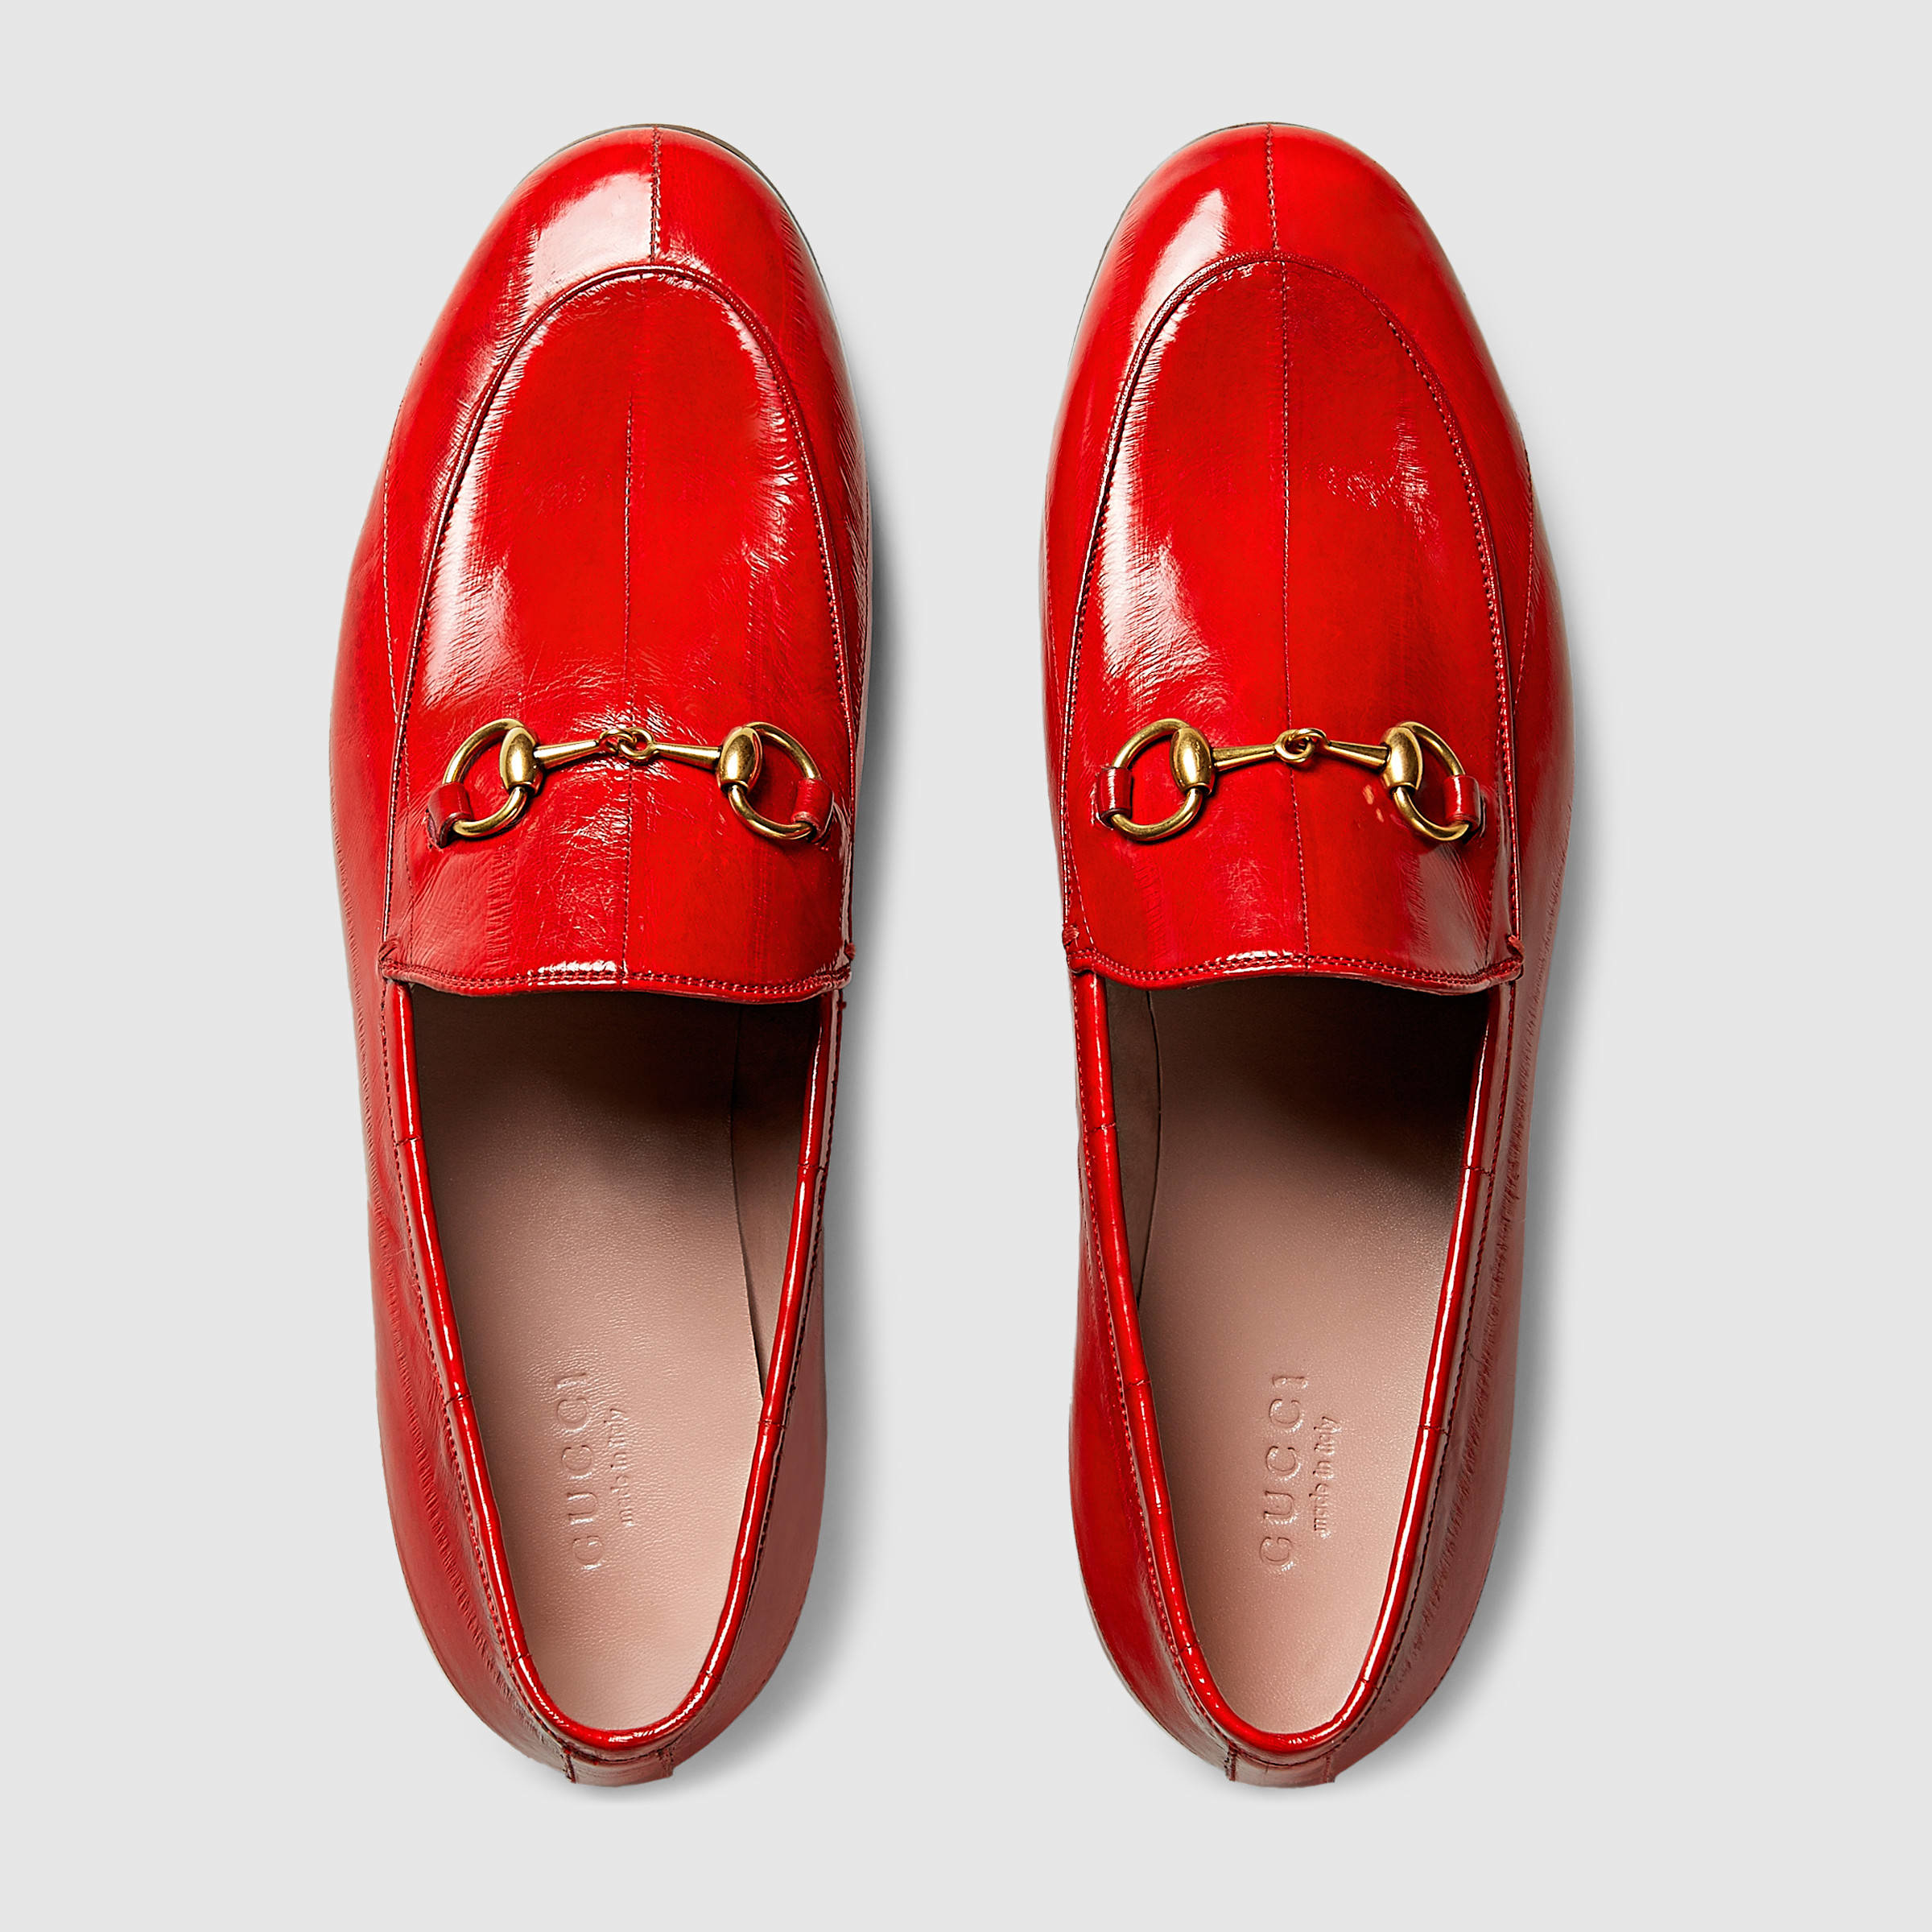 5c51cb9aed3 Gucci Jordaan Eel Horsebit Loafer in Red - Lyst